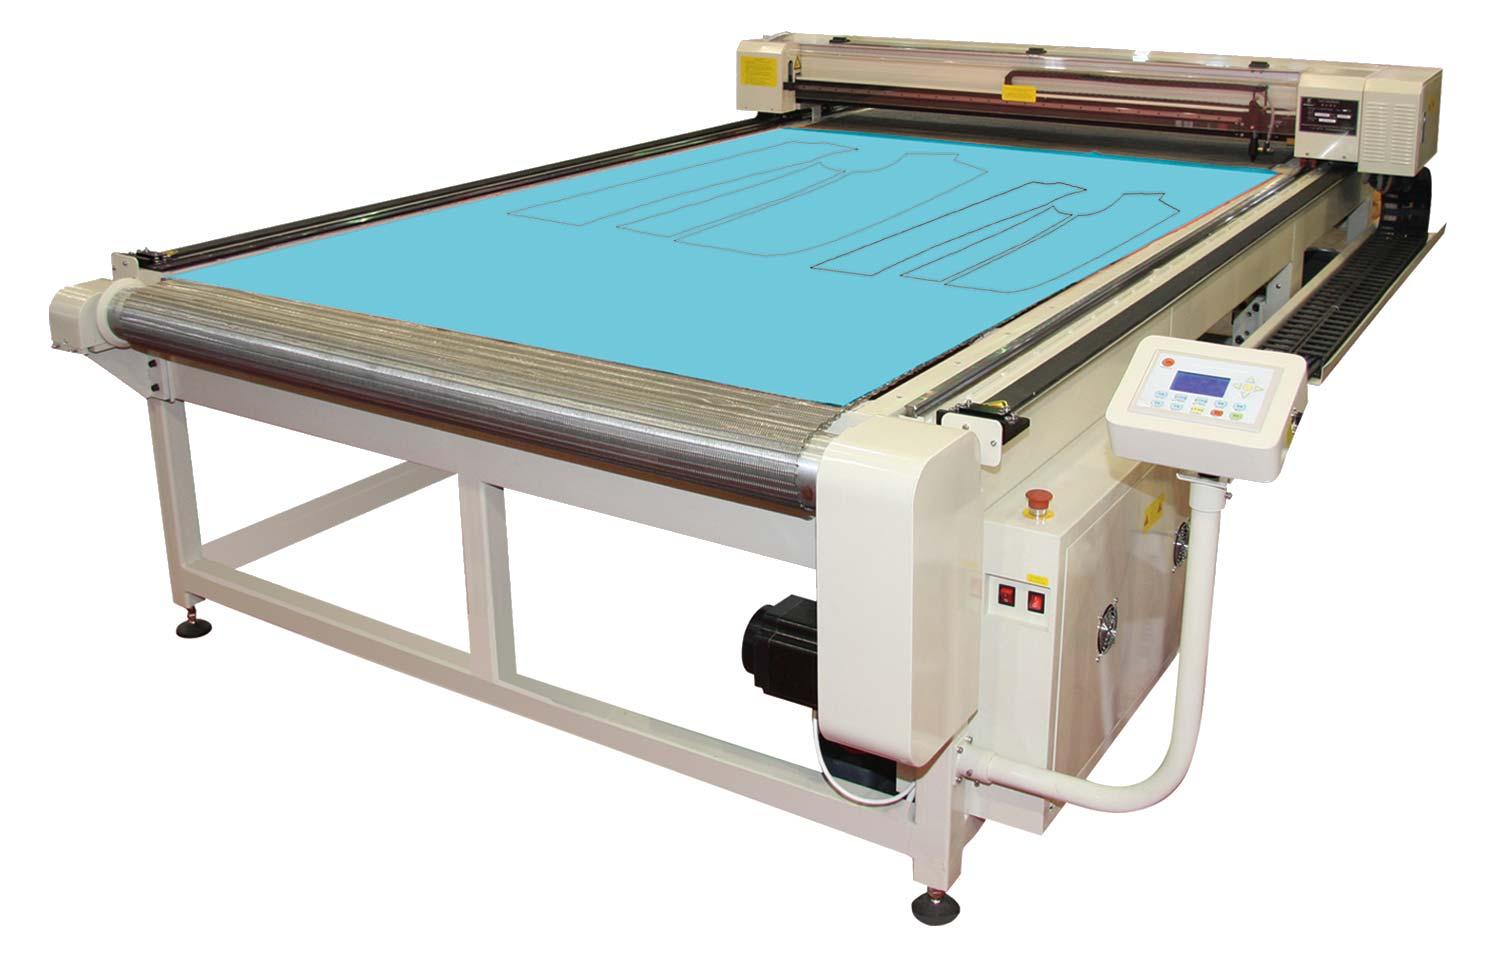 Maquina de cortar tecido a laser